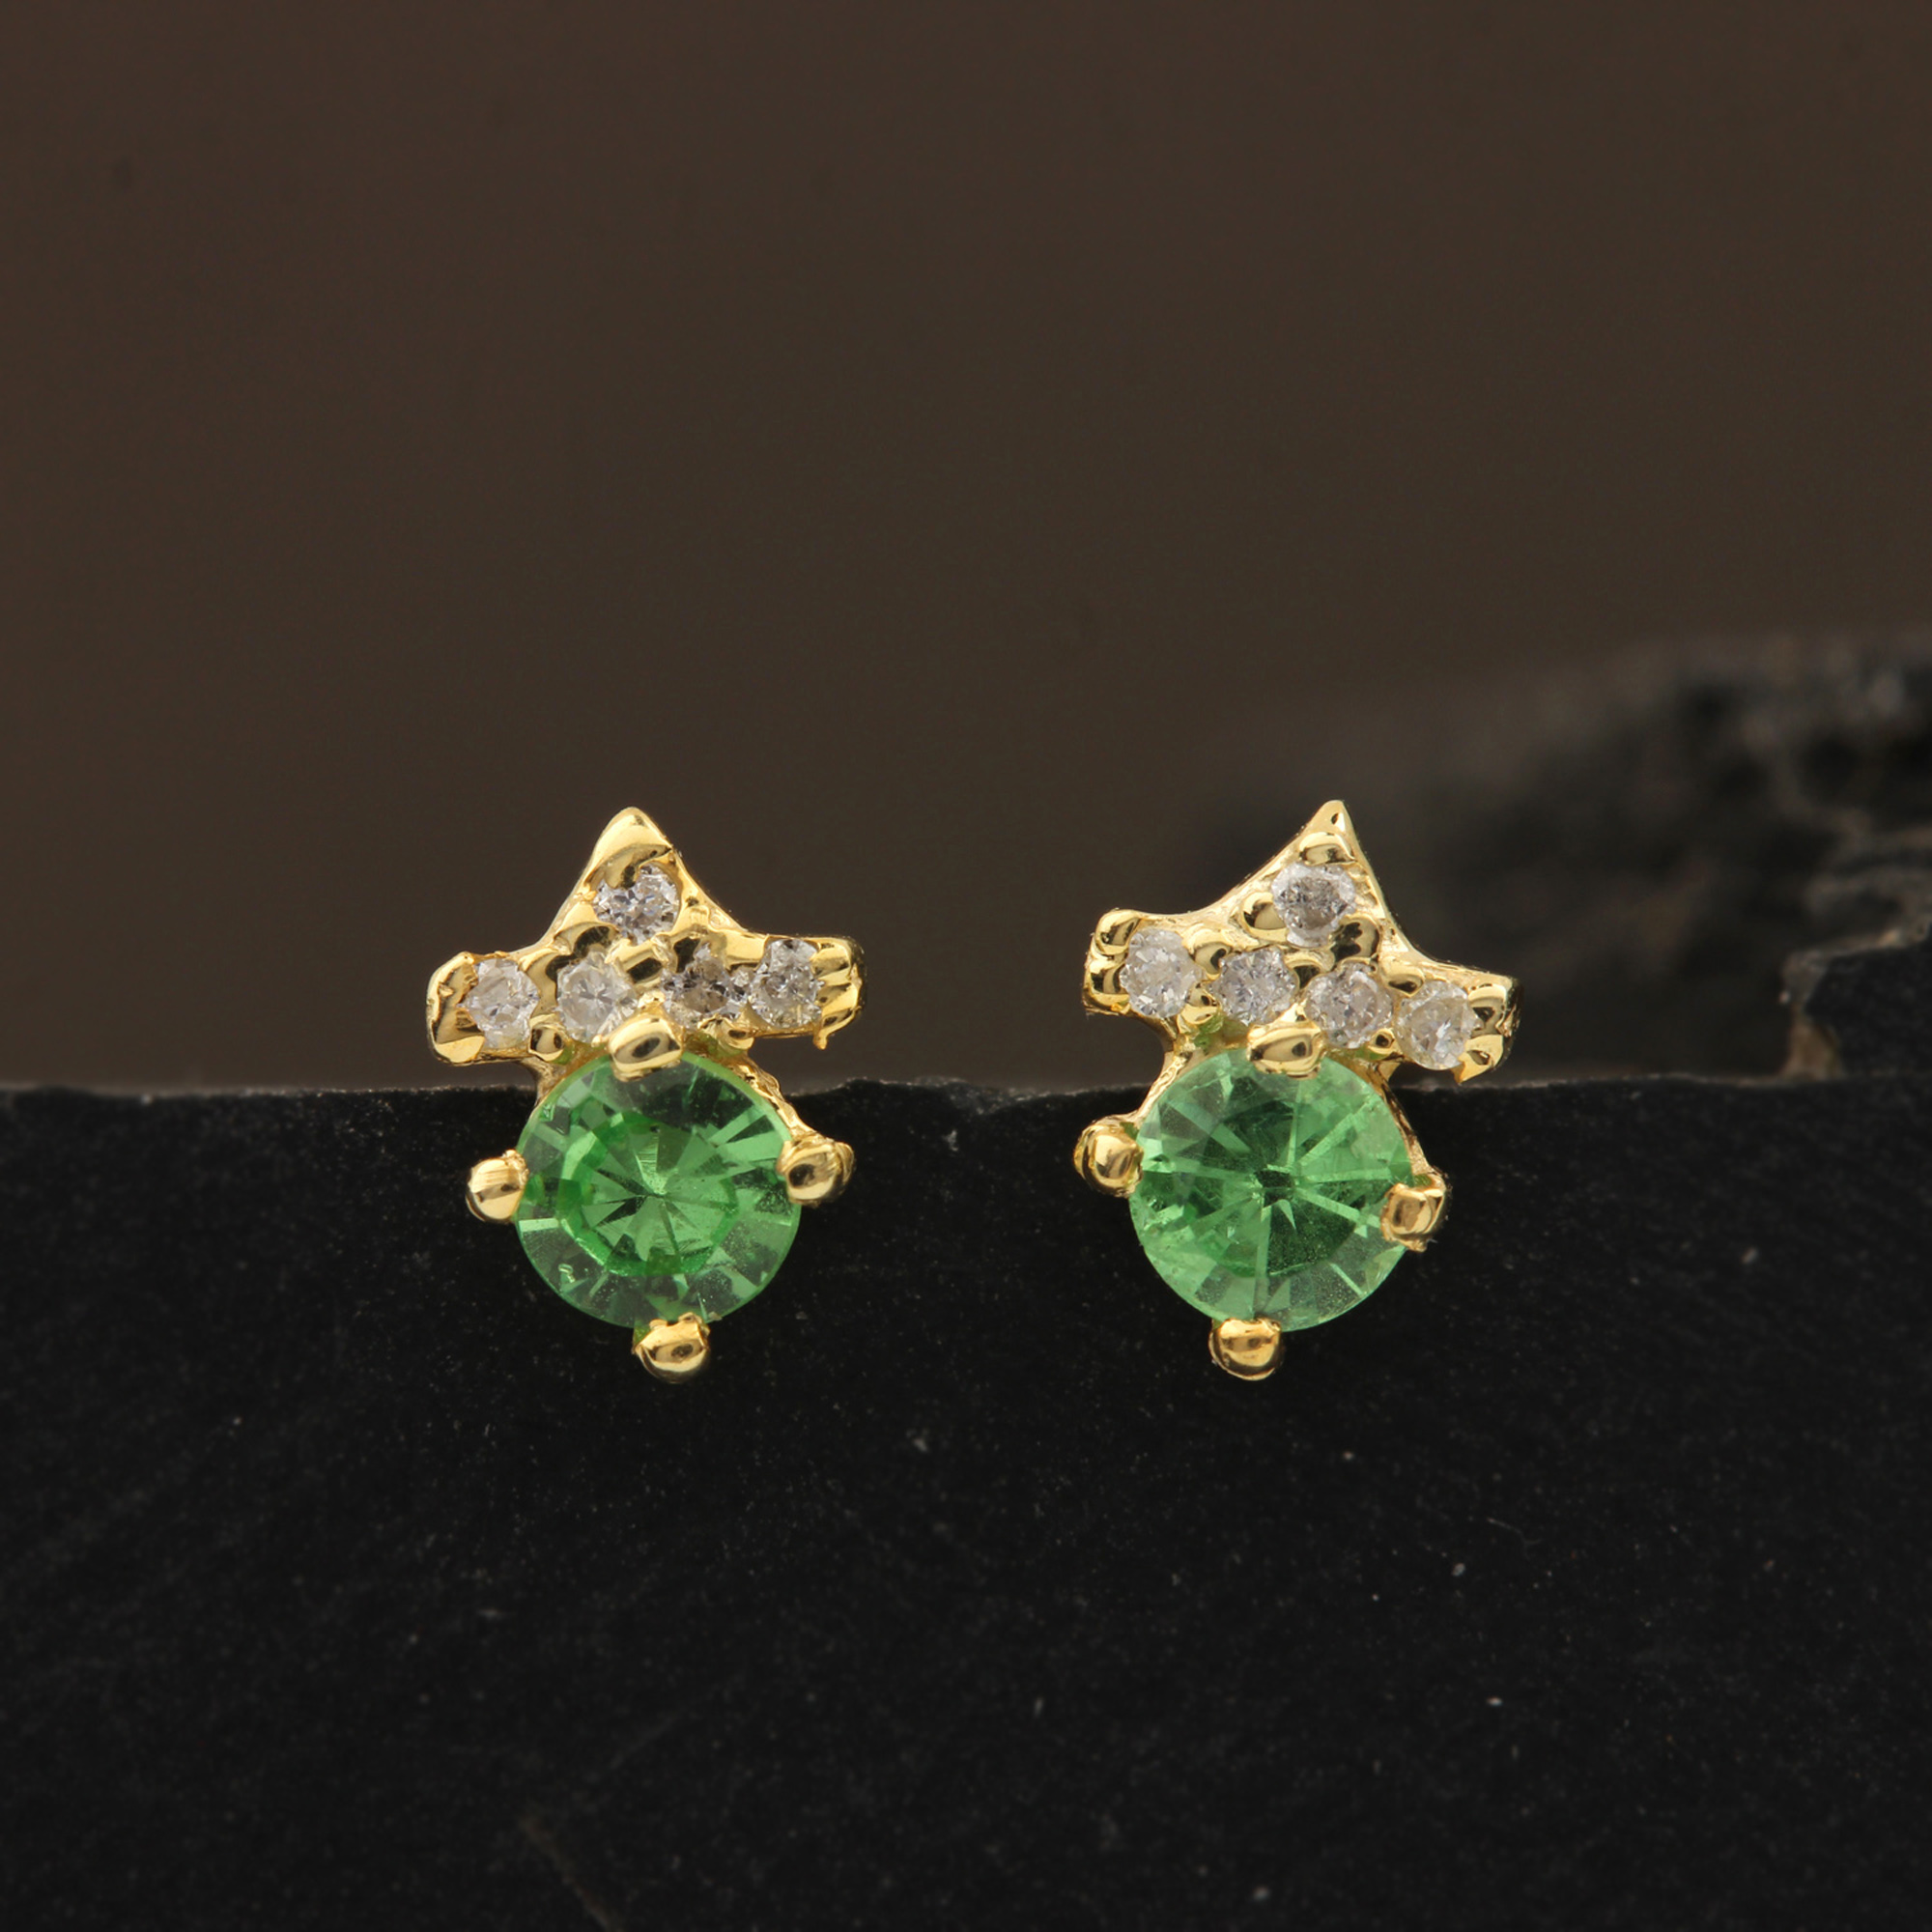 Natural Diamond & Tsavorite 14k Solid Gold Solitaire Stud Earrings